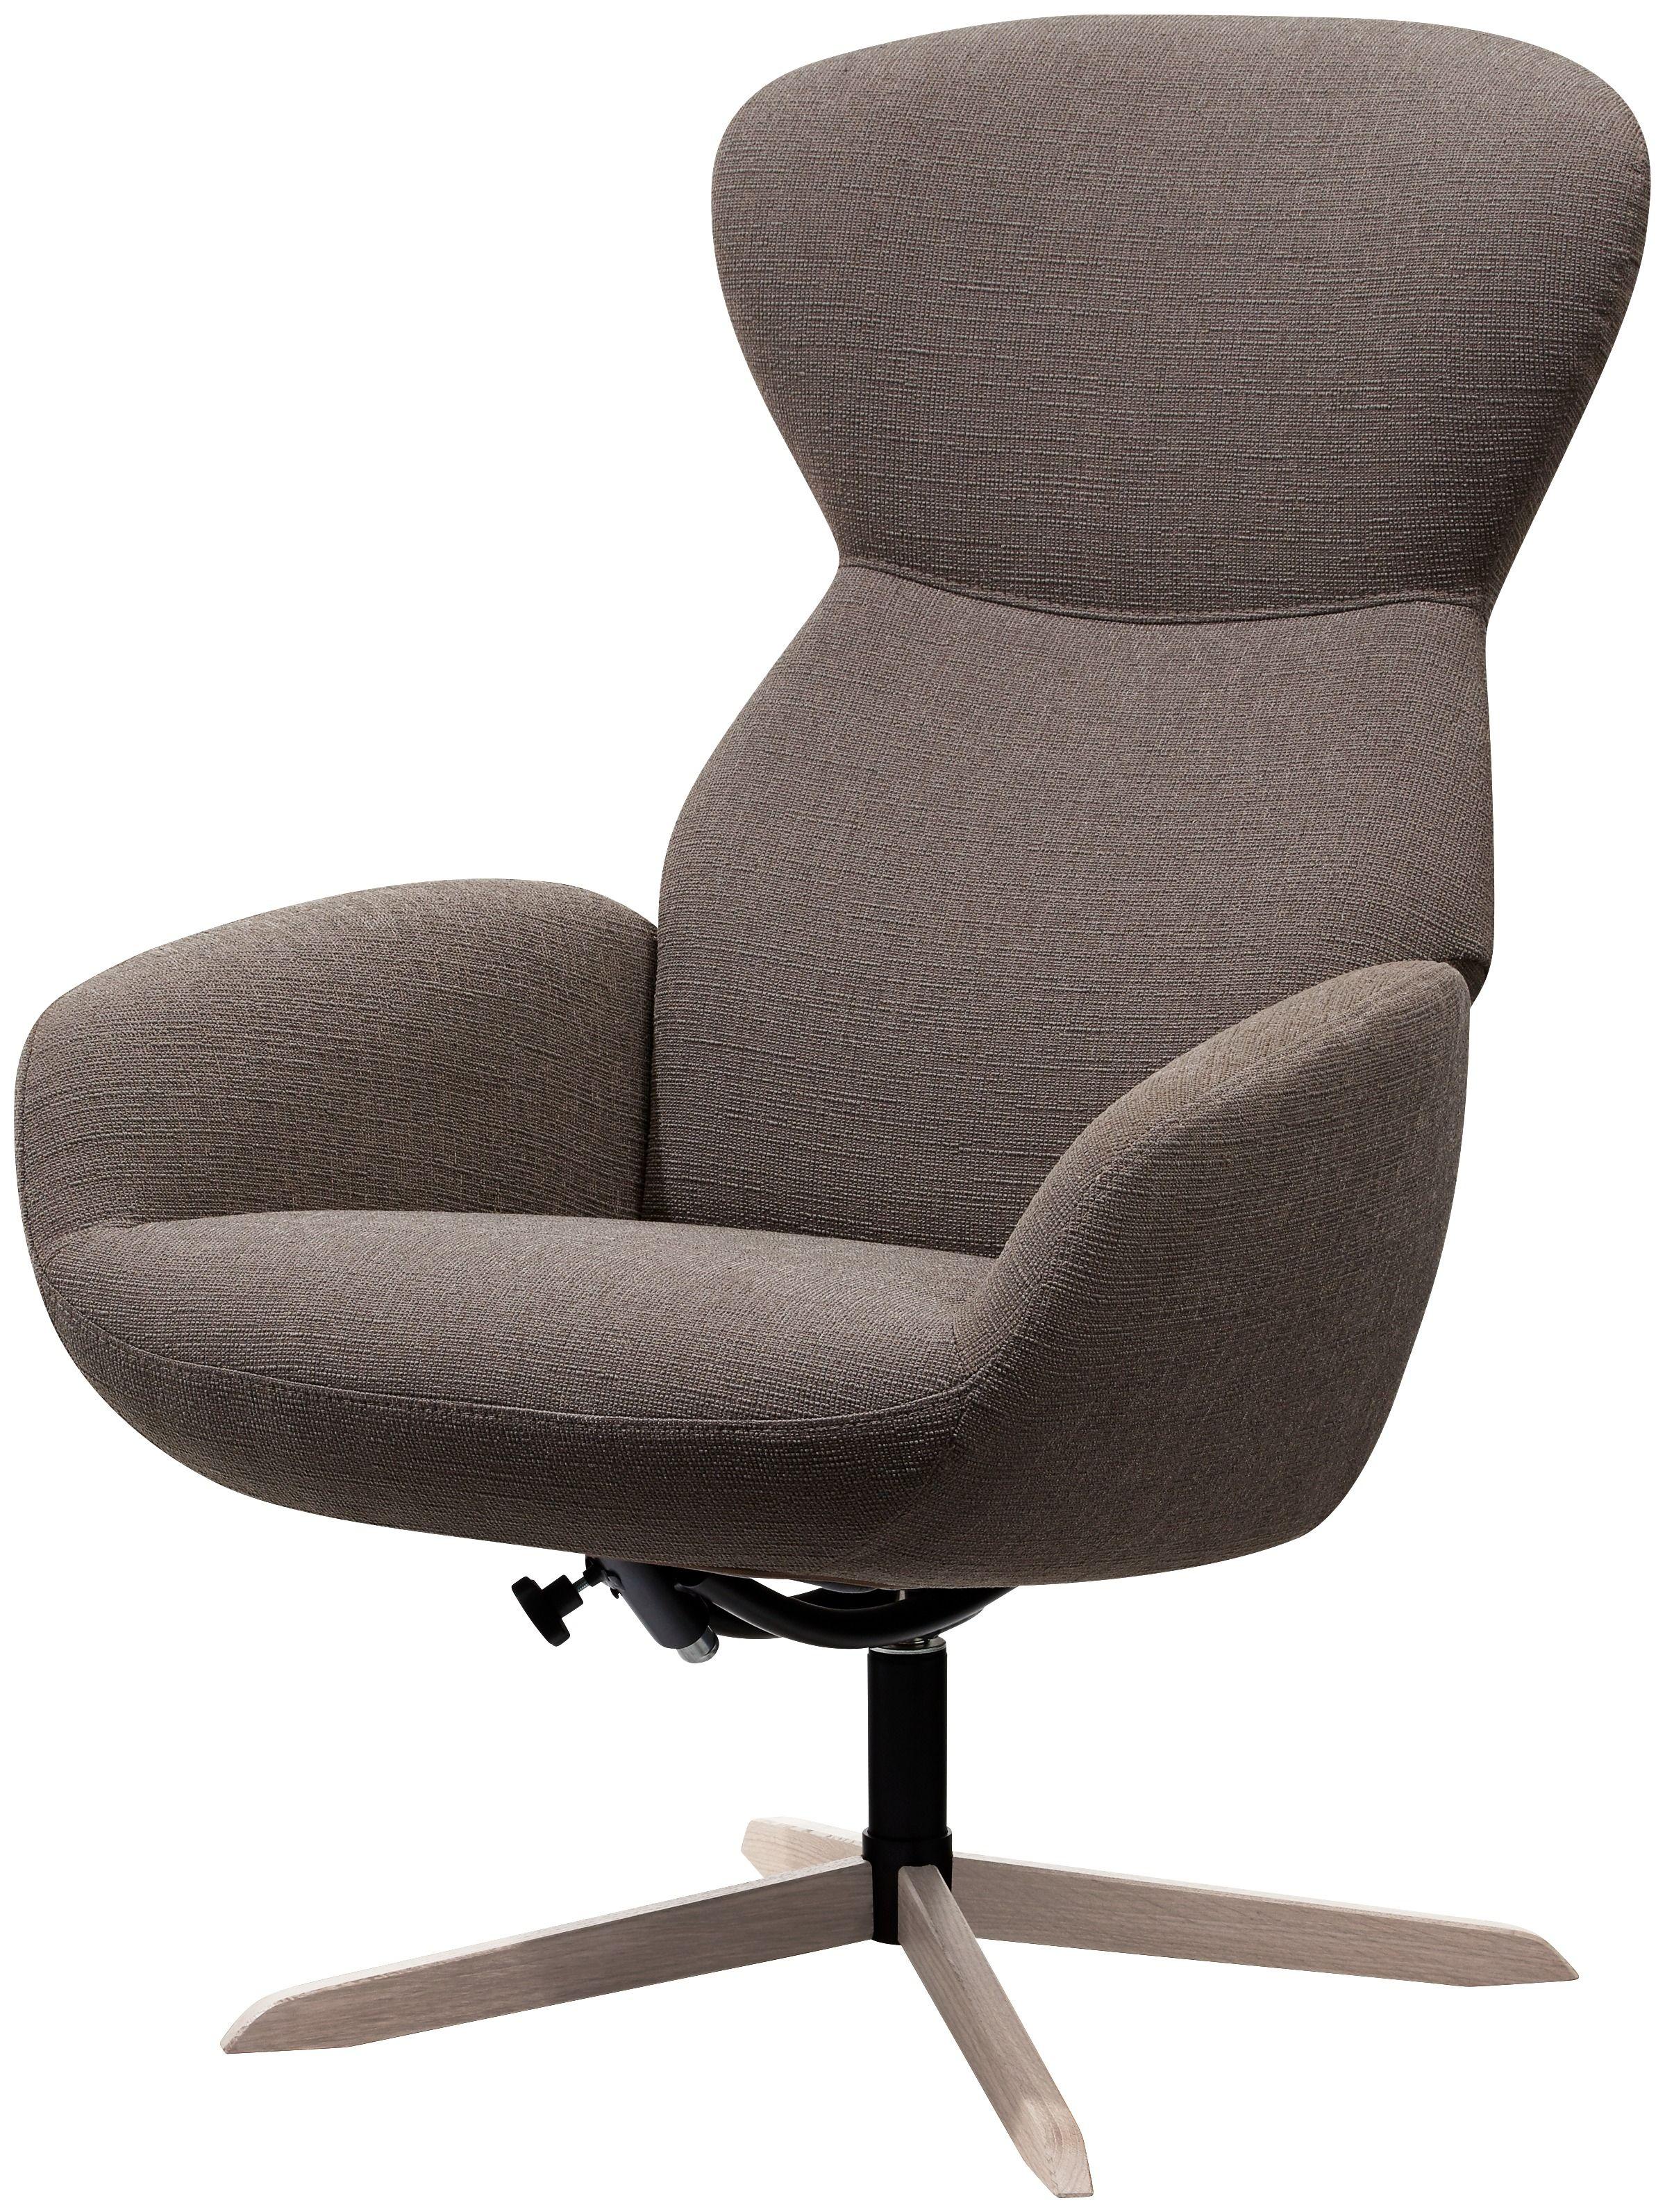 BoConcept Athena Sessel boconcept scandinaviandesign interiordesign interior design  ...